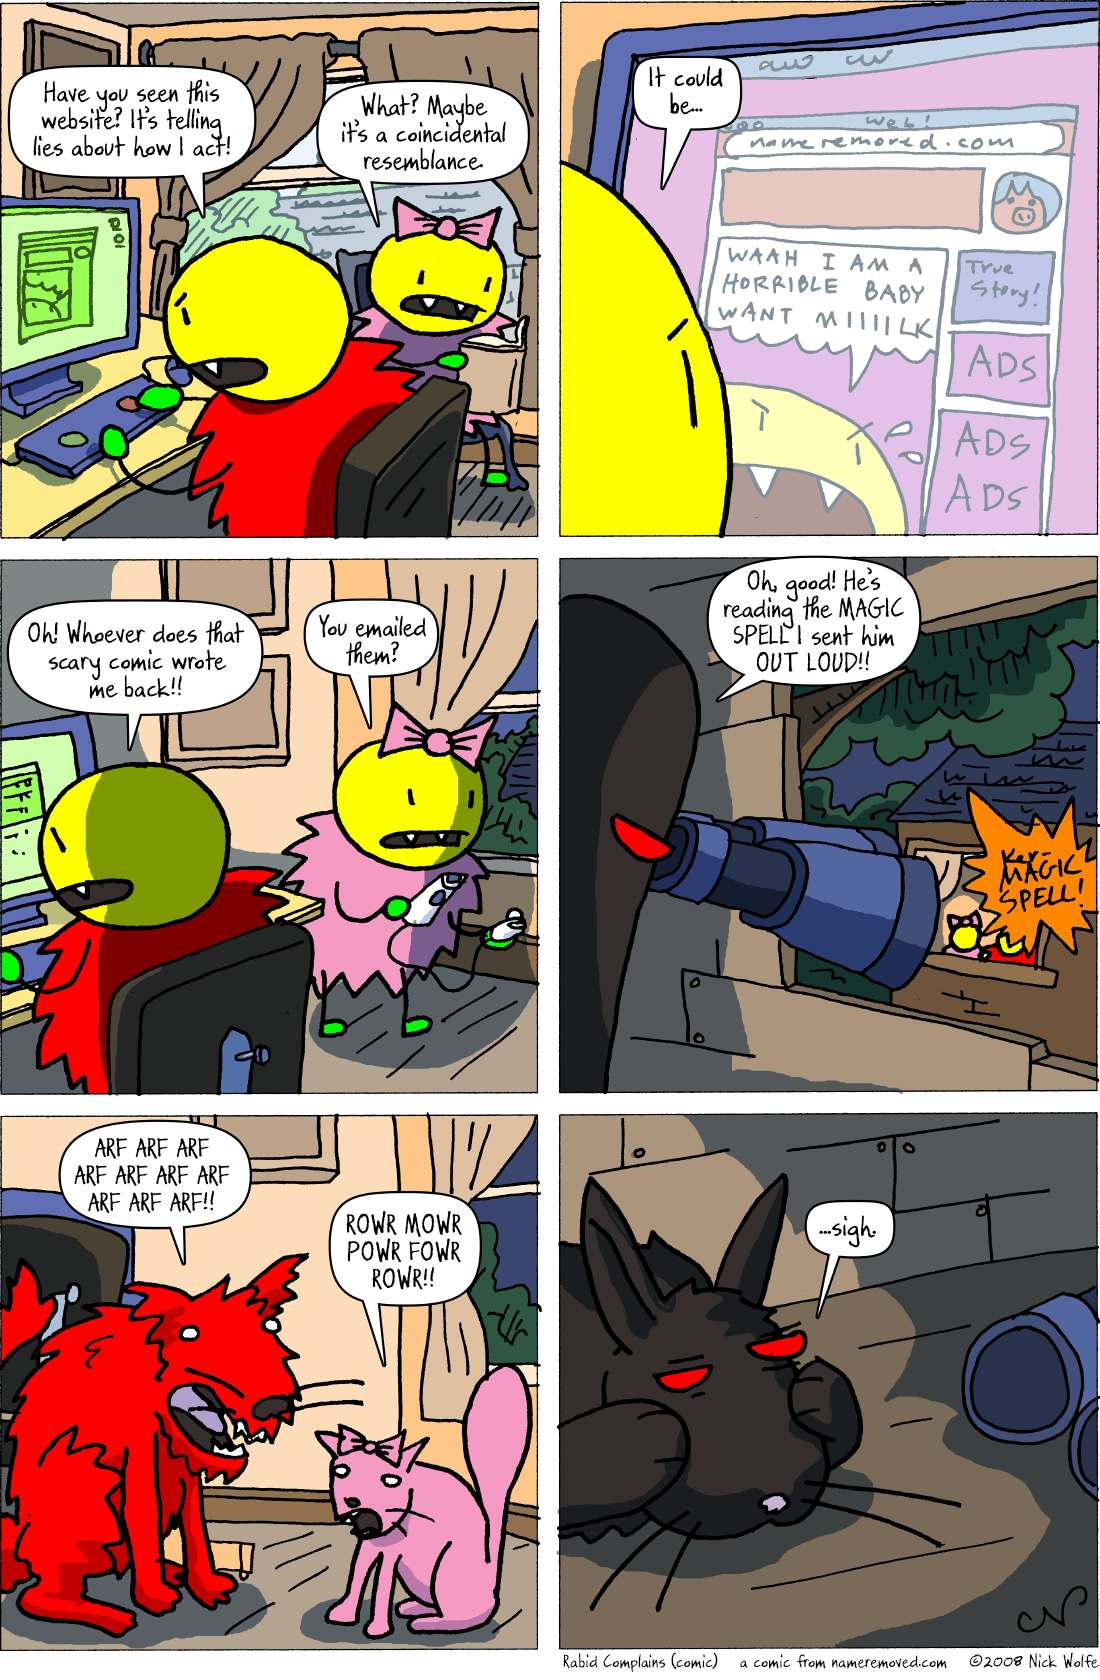 Rabid Complains (comic)